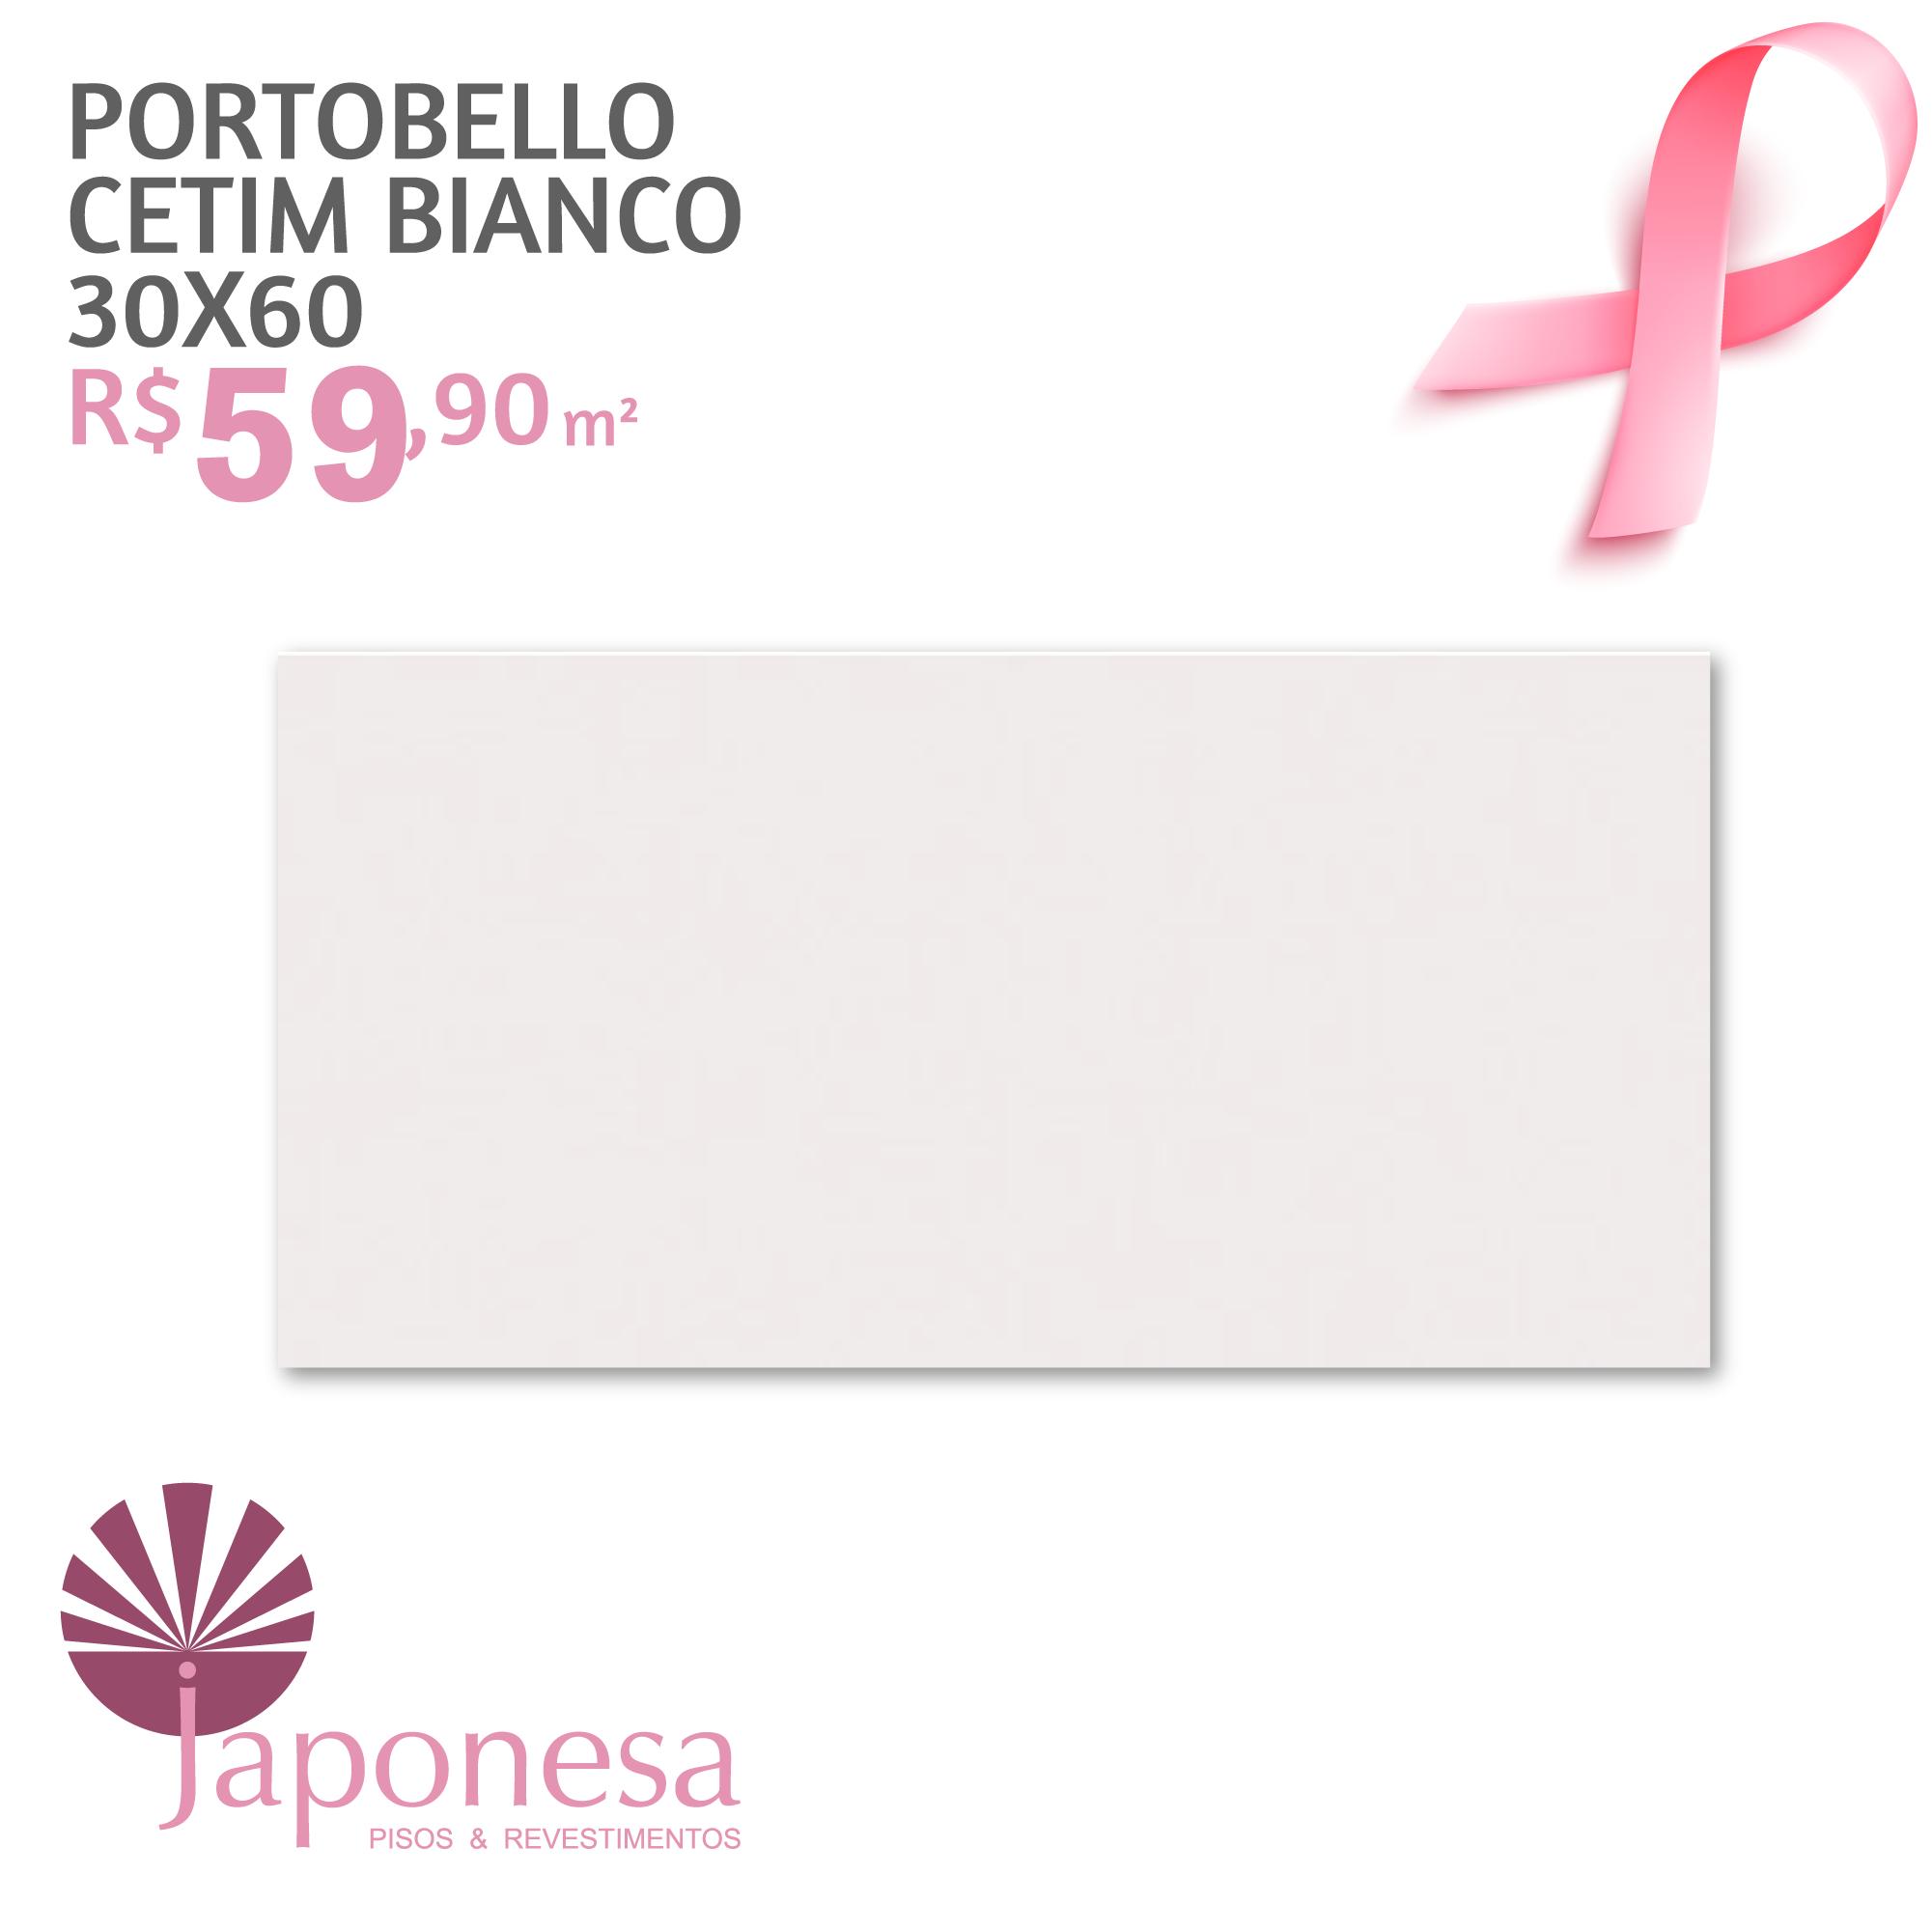 Portobello Cetim Bianco 30×60